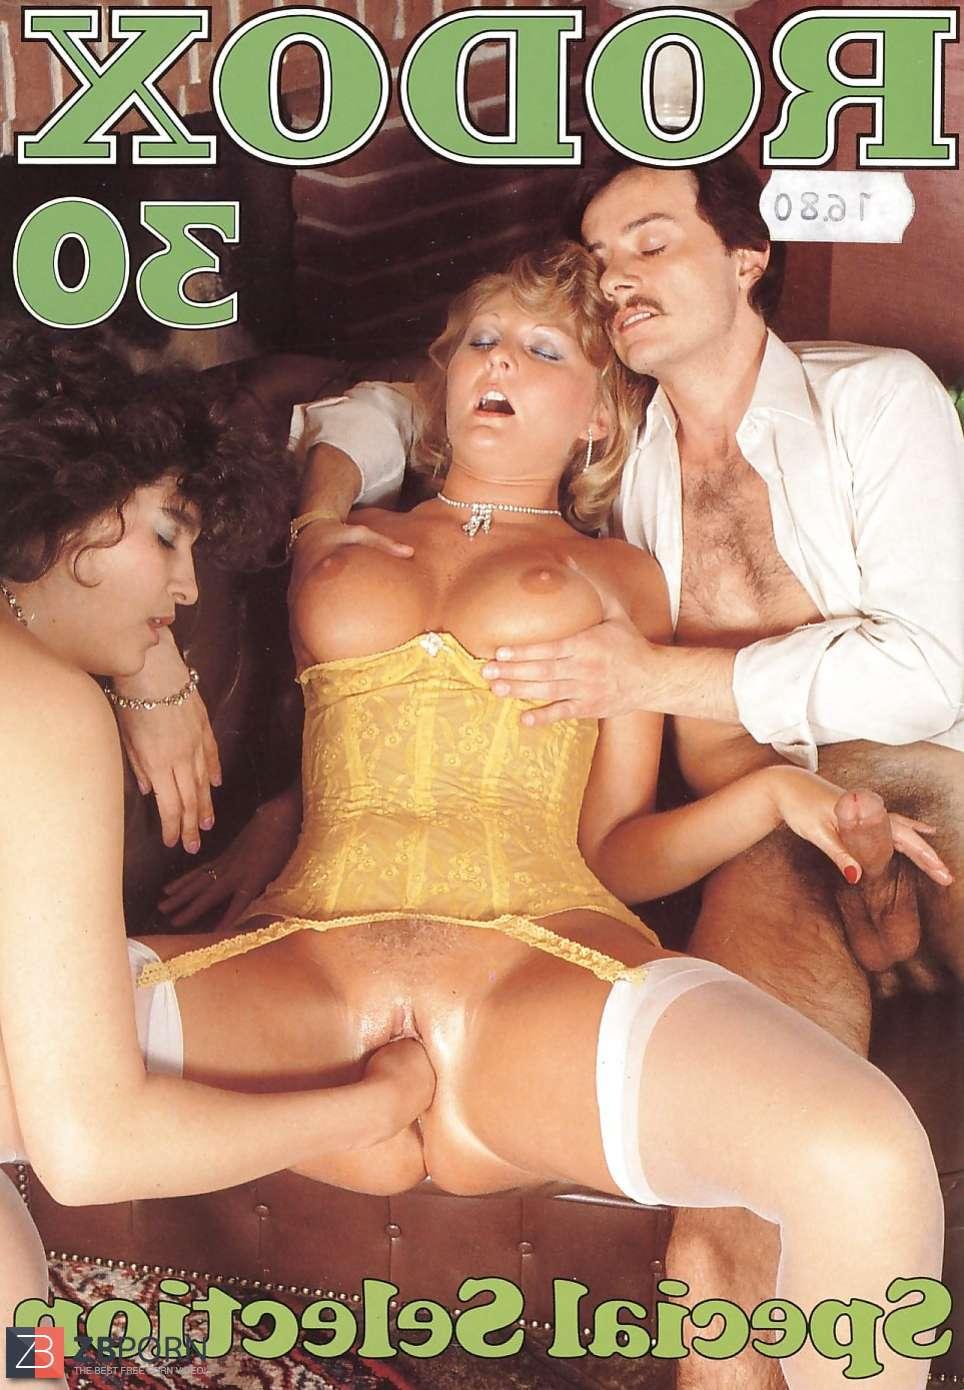 Bbw Porn Magazine classic magazine series 1980s / zb porn